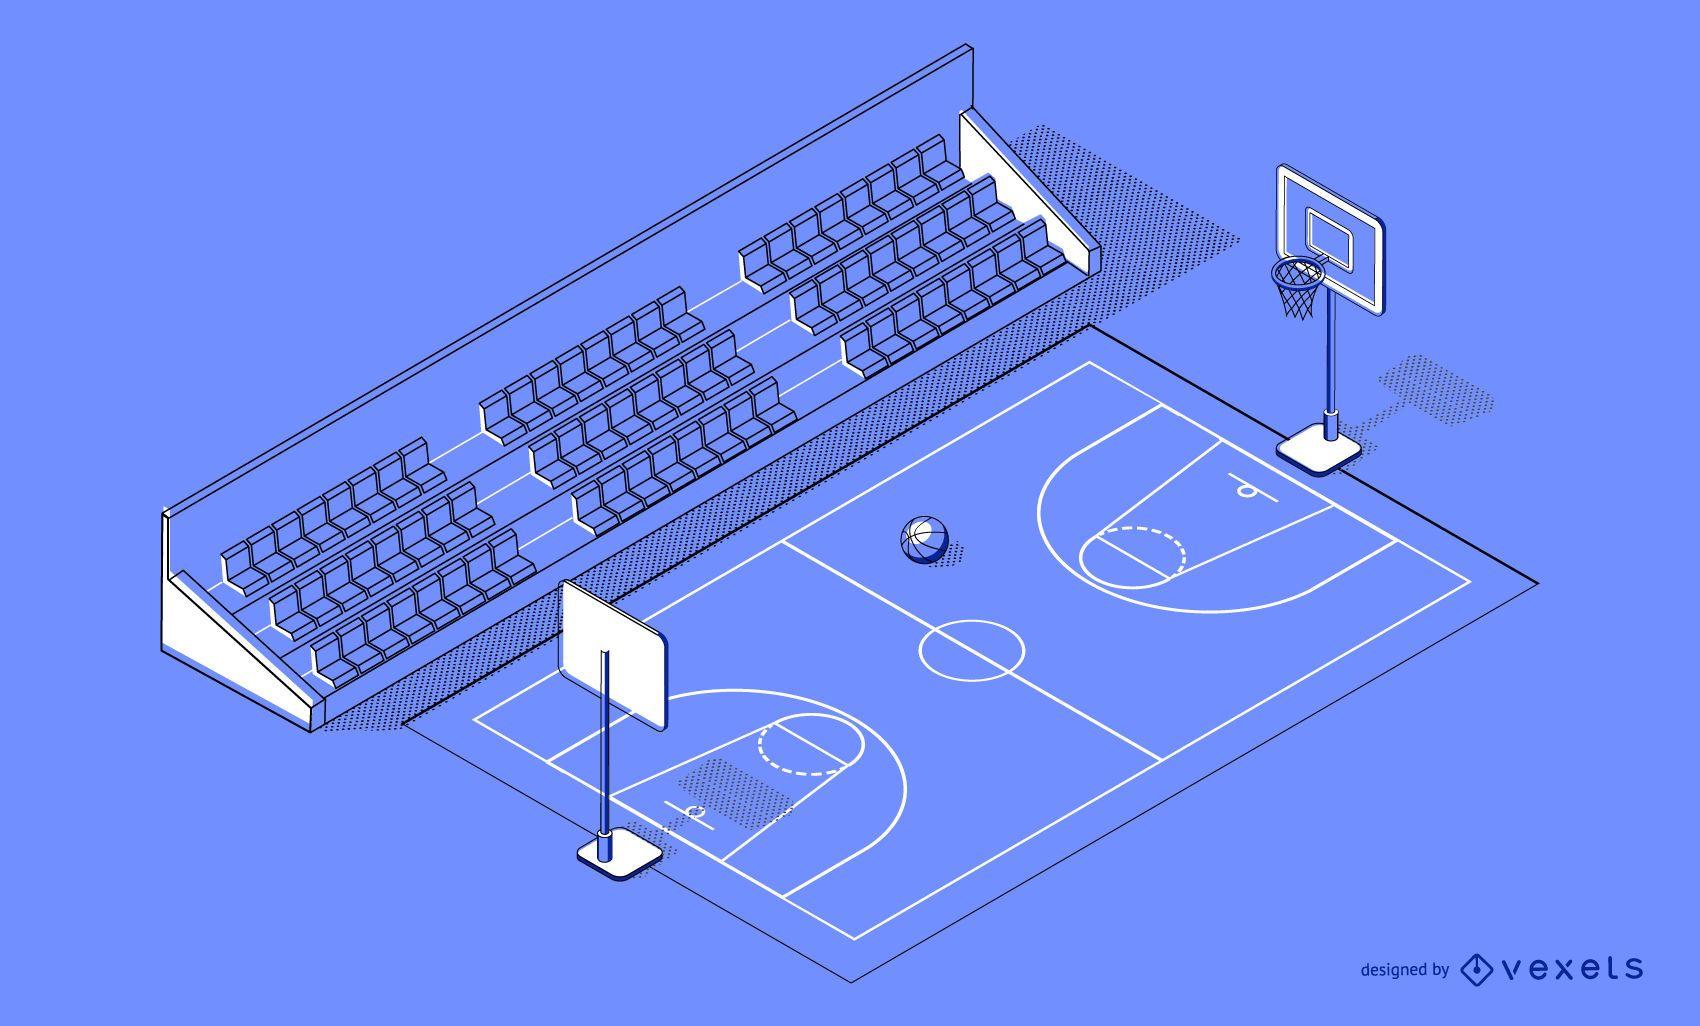 Diseño de cancha de baloncesto isométrica